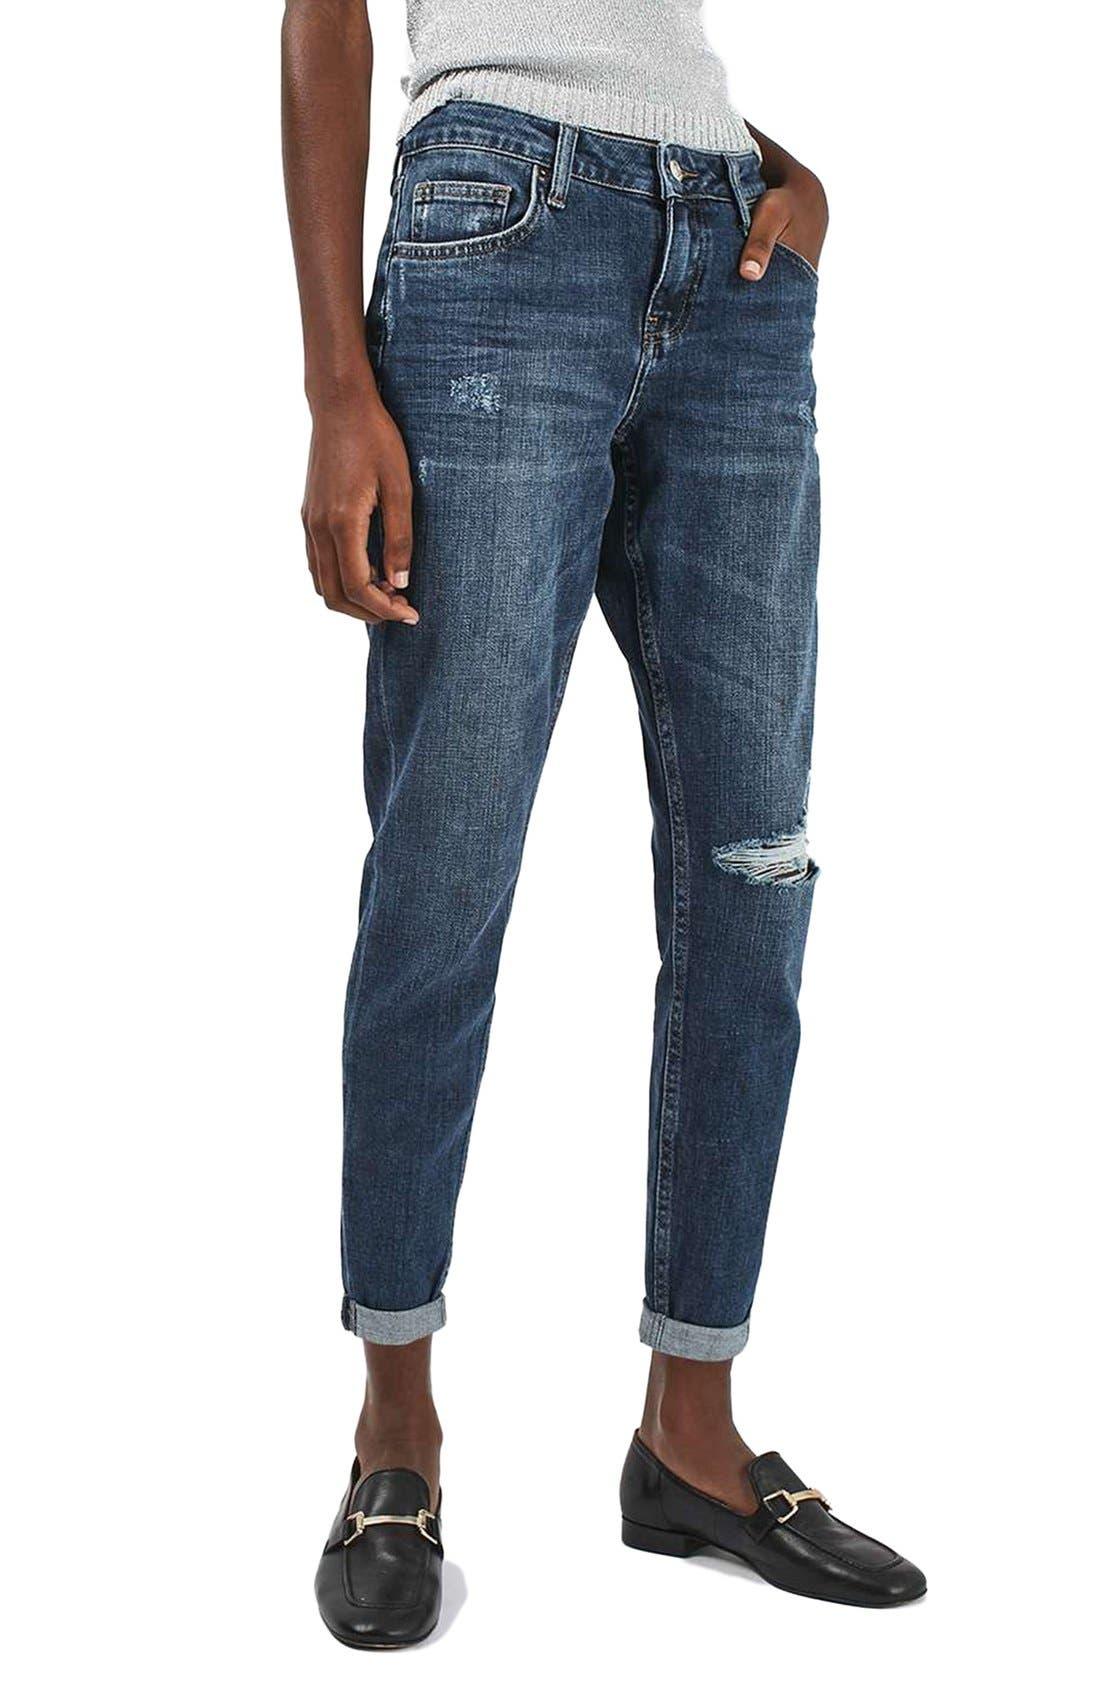 Alternate Image 1 Selected - Topshop Lucas Ripped Boyfriend Jeans (Petite)